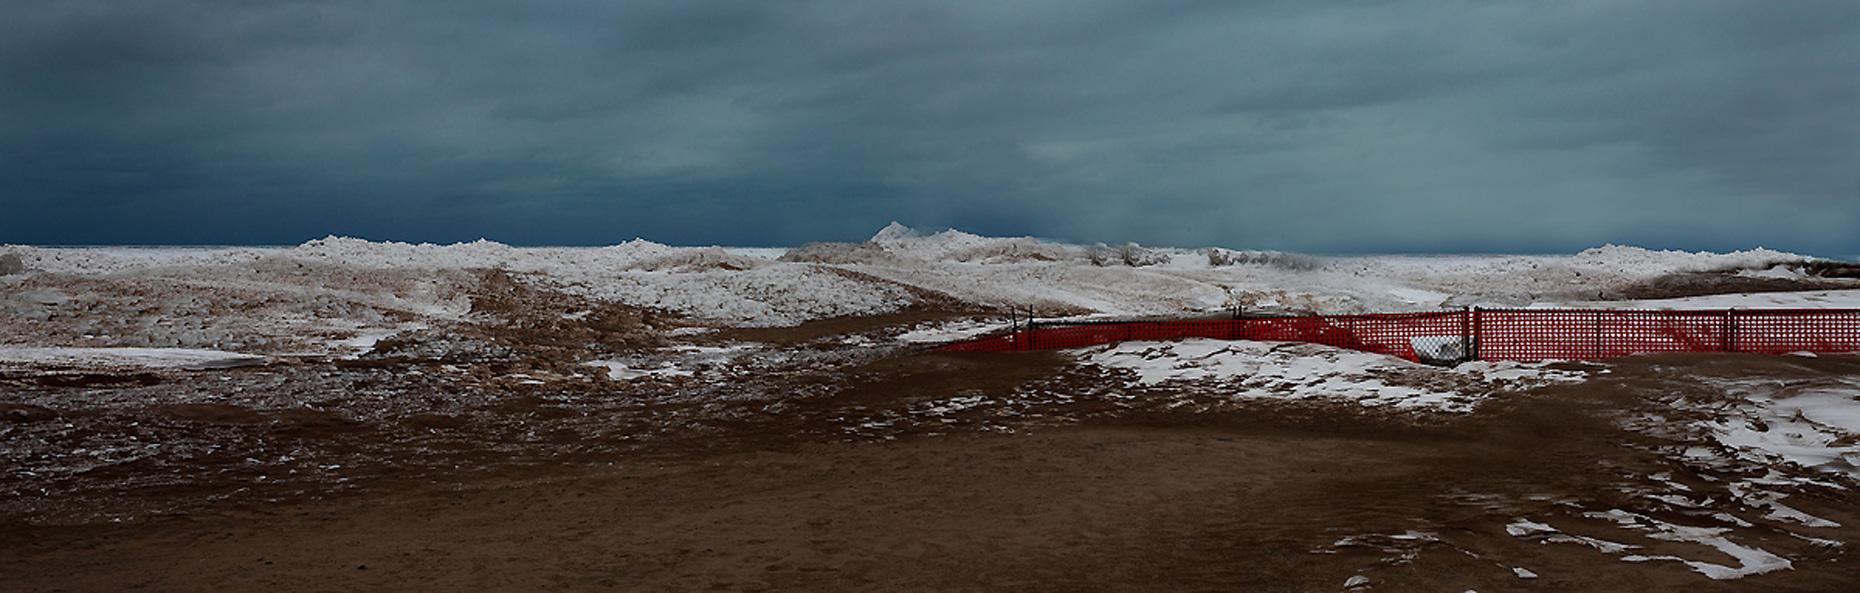 snowscape3.jpg